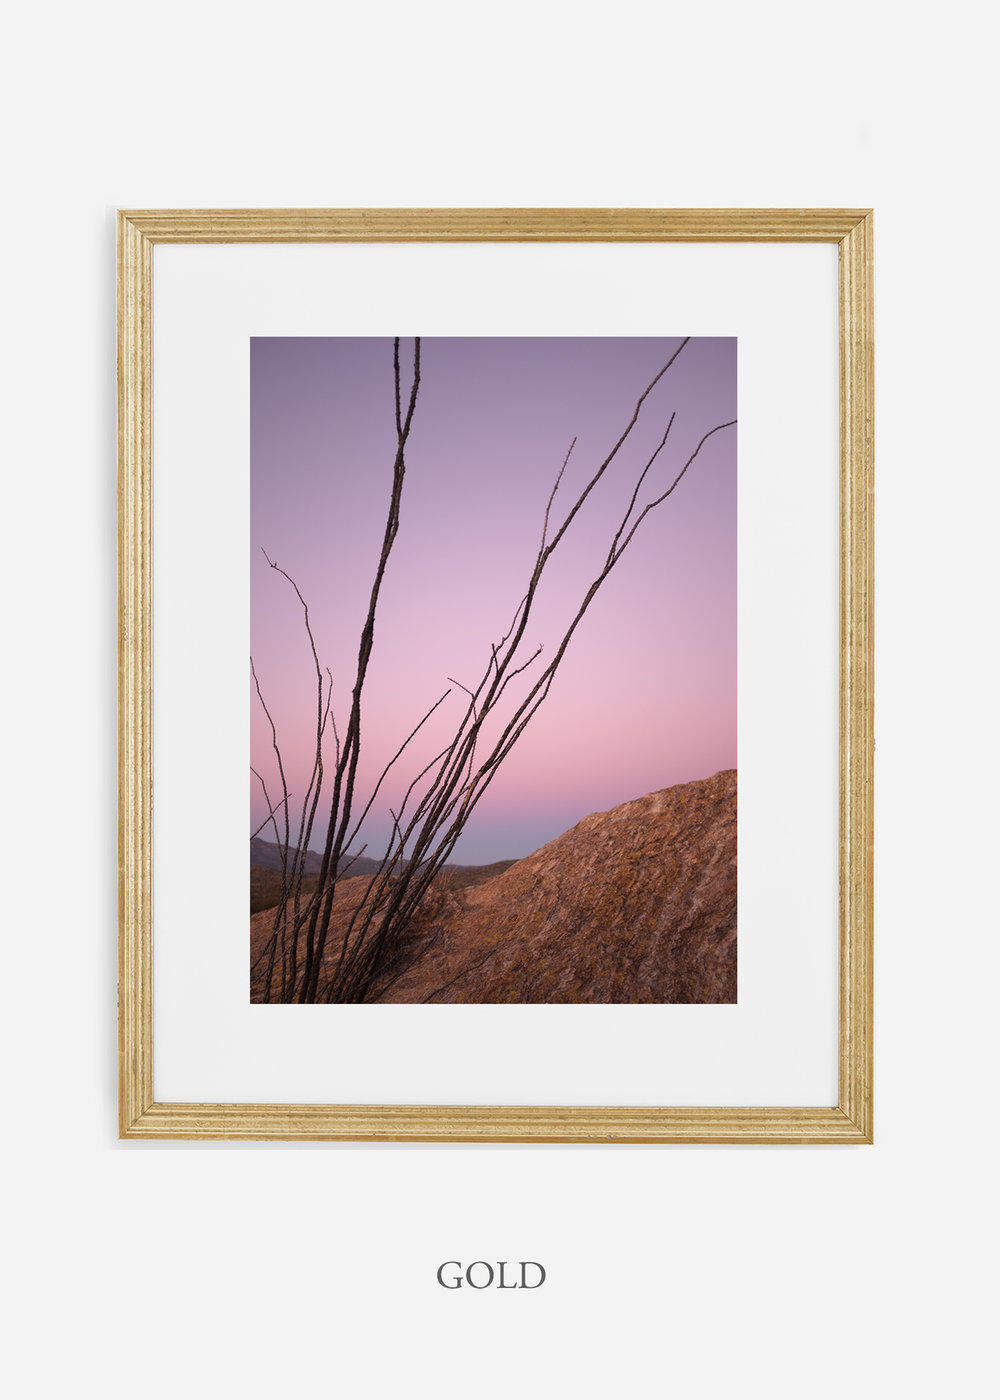 goldframe-saguaroNo.12-wildercalifornia-art-wallart-cactusprint-homedecor-prints-arizona-botanical-artwork-interiordesign.jpg